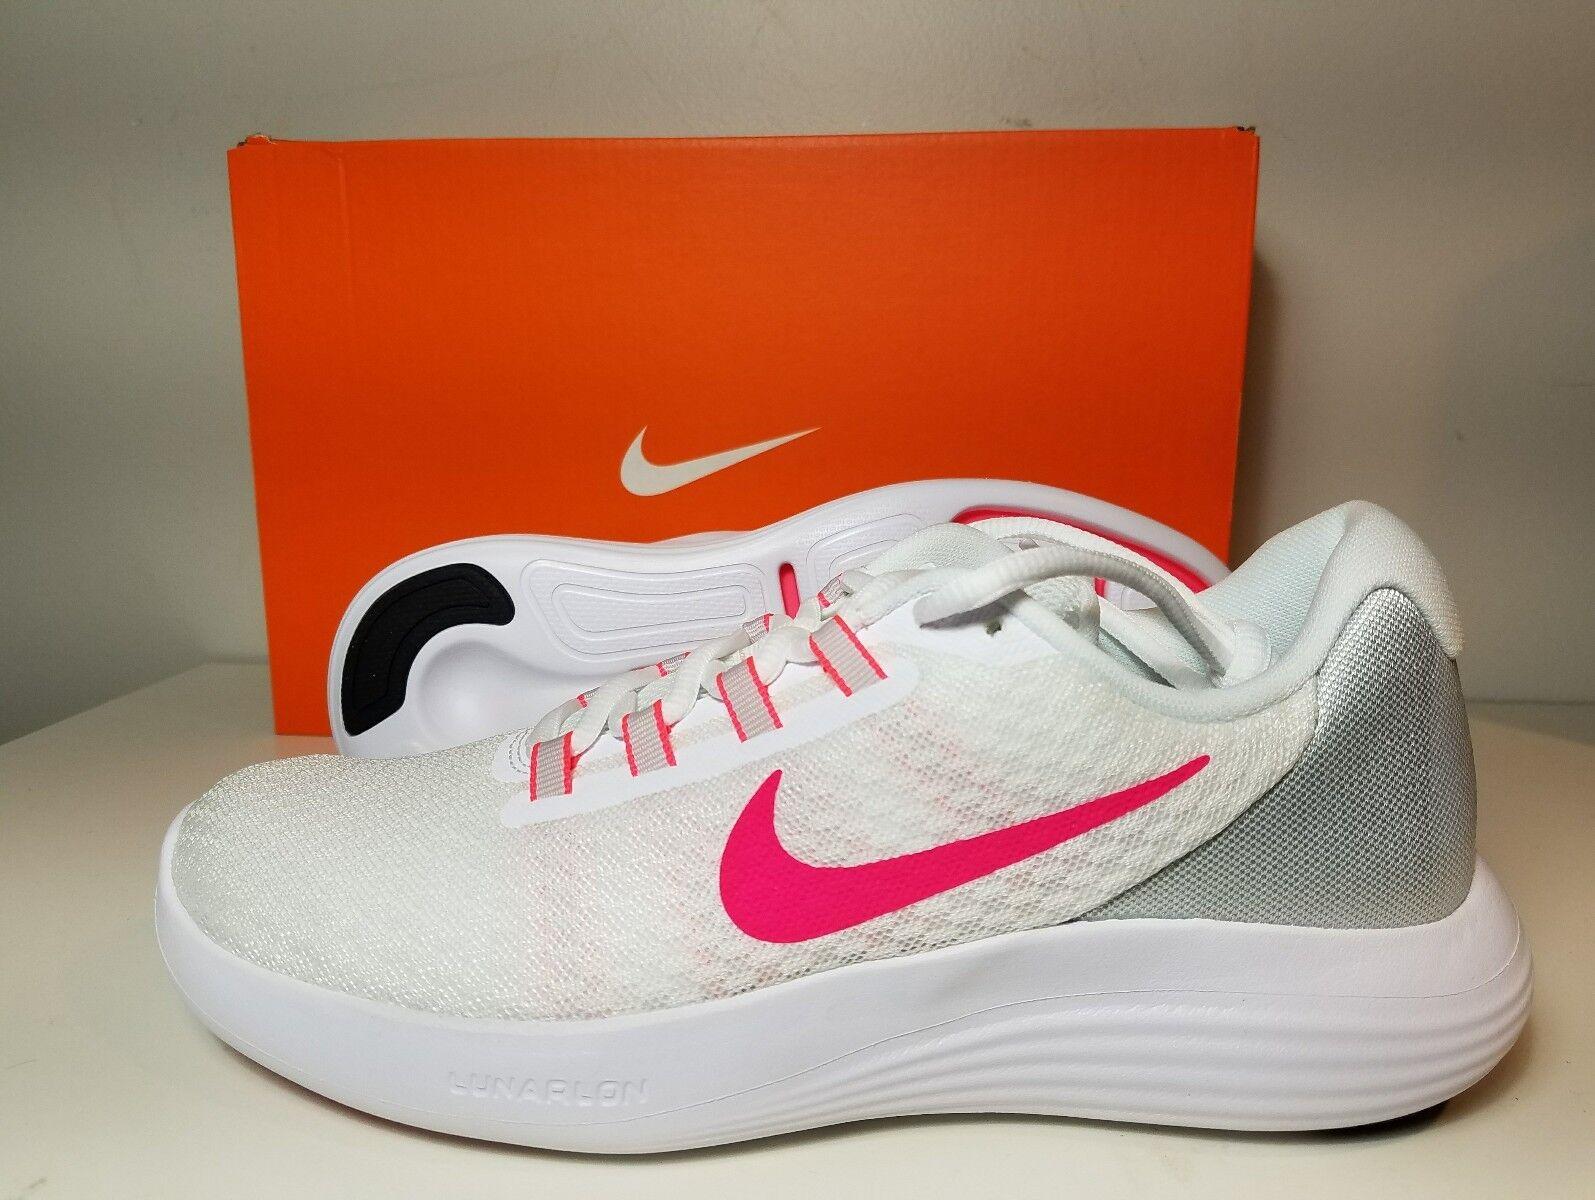 big sale c1ec2 95edd Nike Womens Lunarconverge Size 9.5 Running shoes White Racer Pink 852469 101